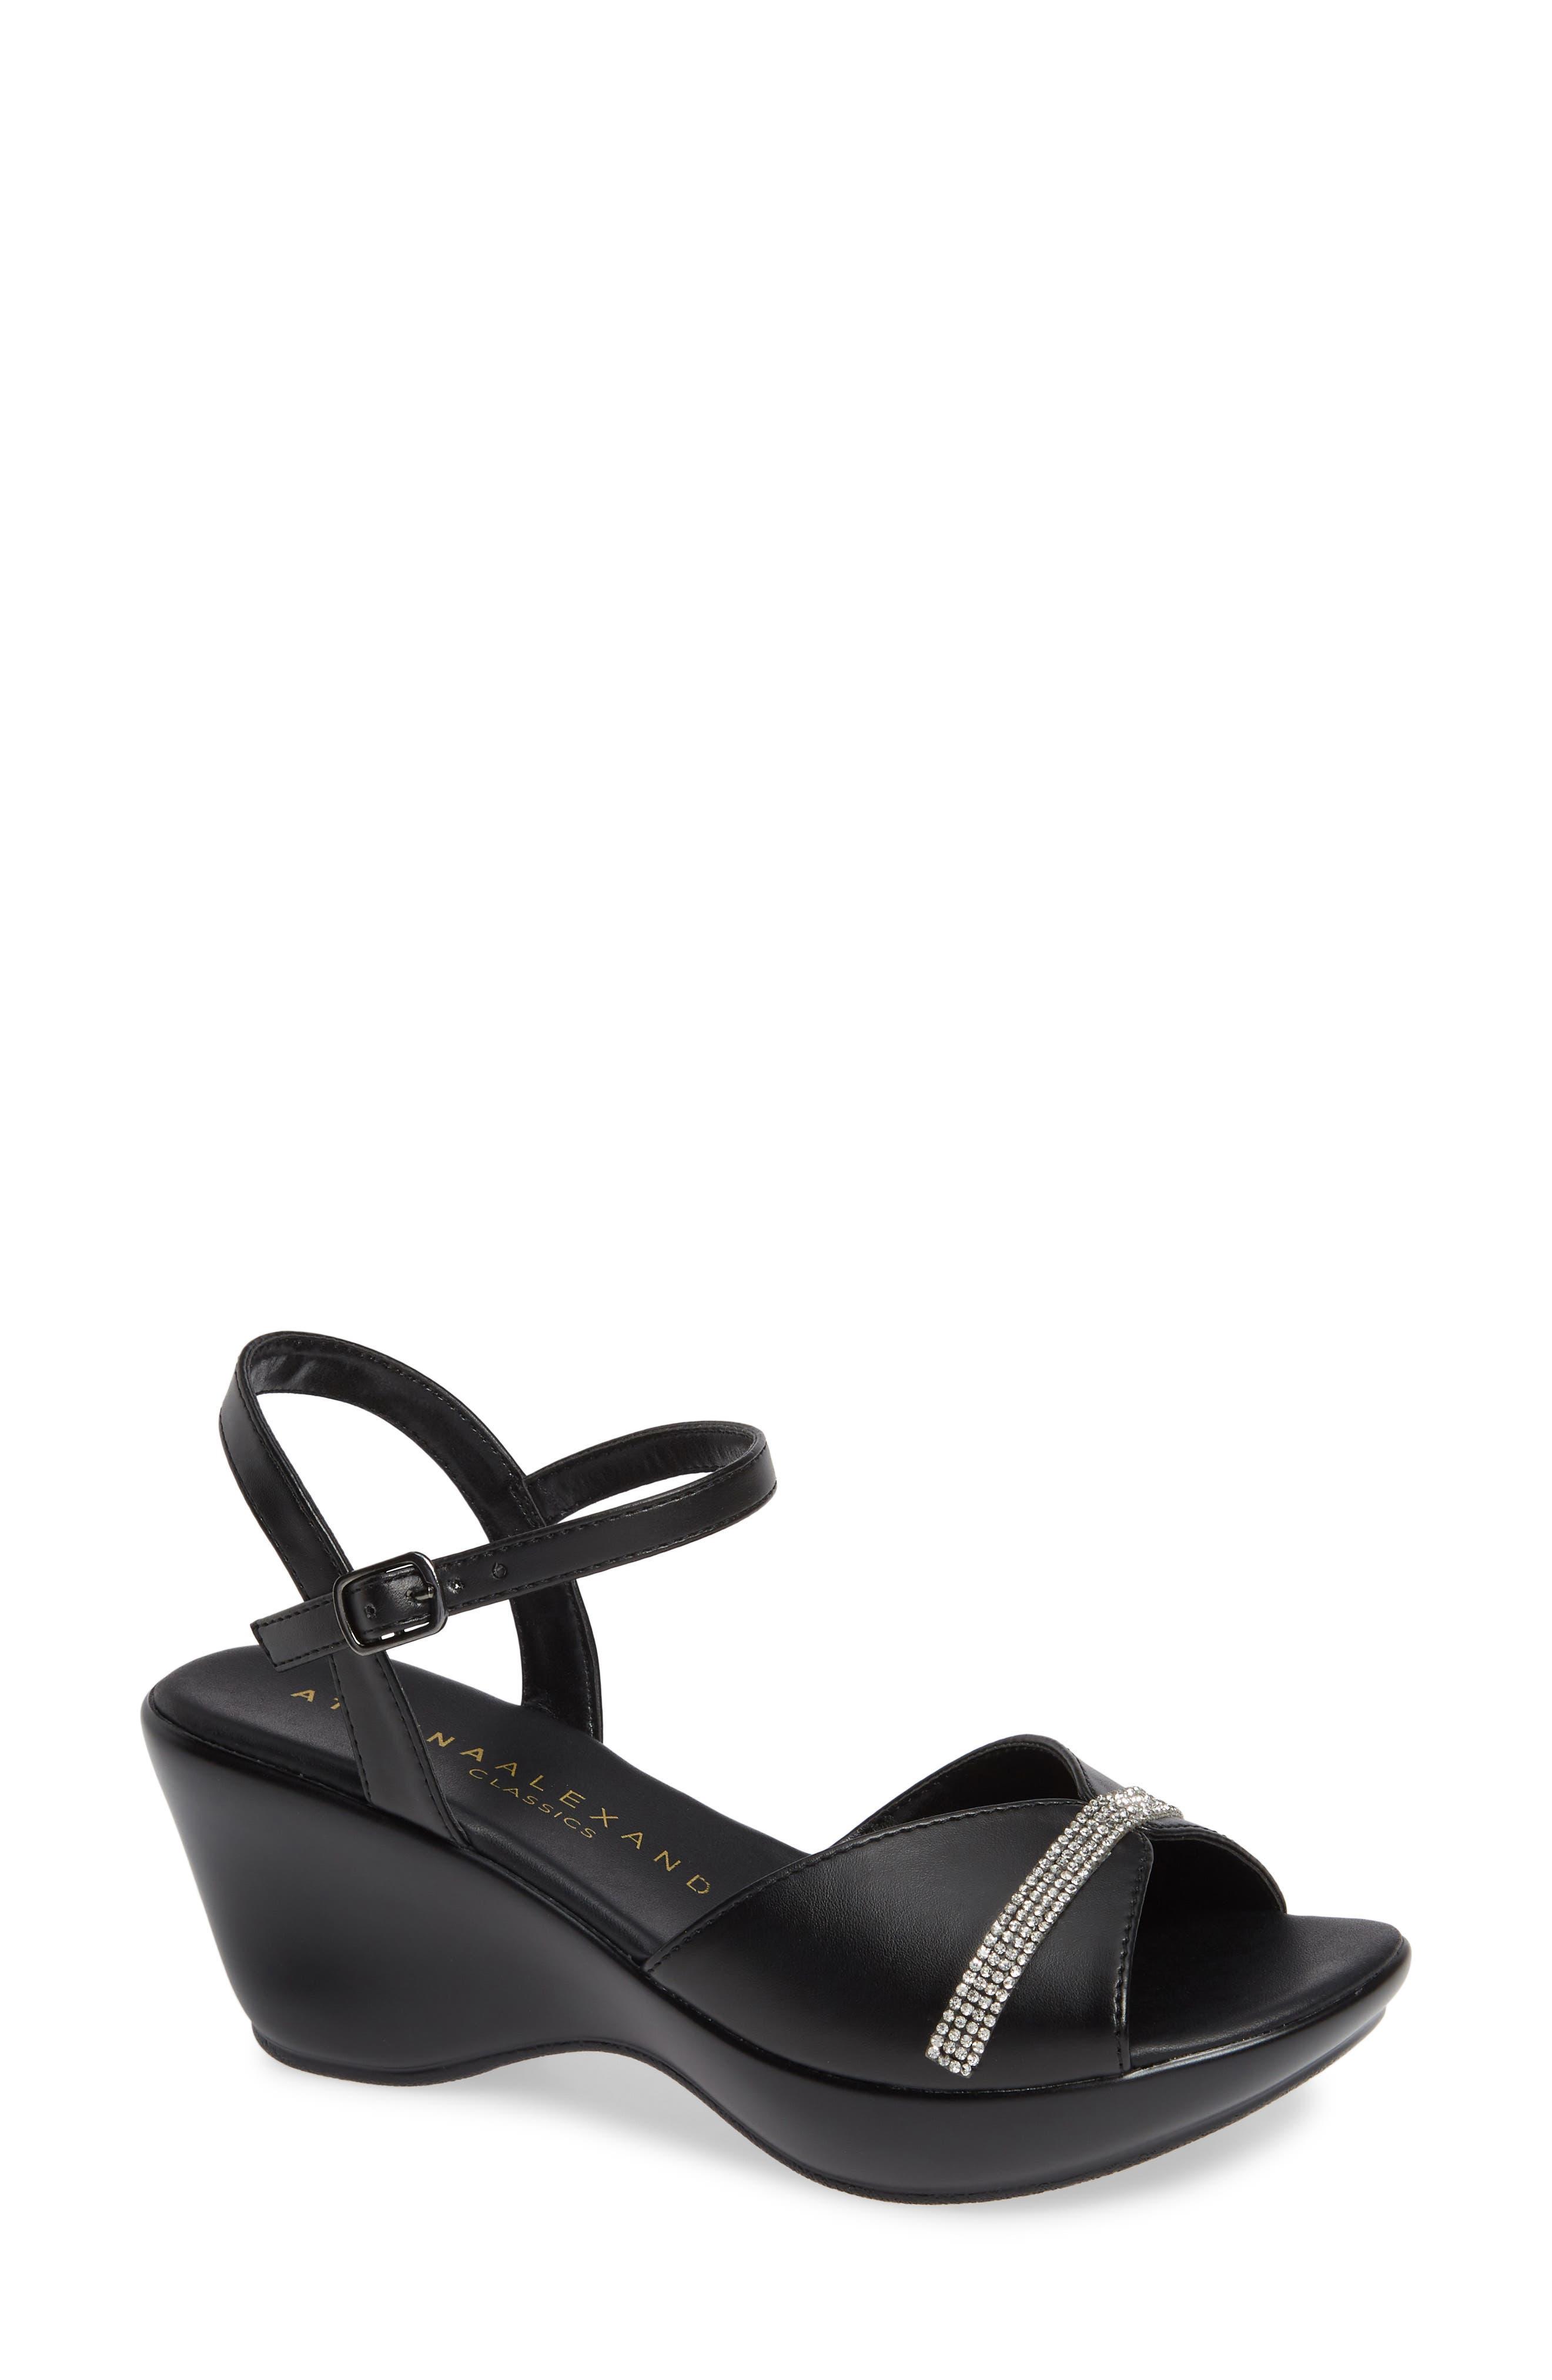 Ambling Wedge Sandal,                             Main thumbnail 1, color,                             BLACK